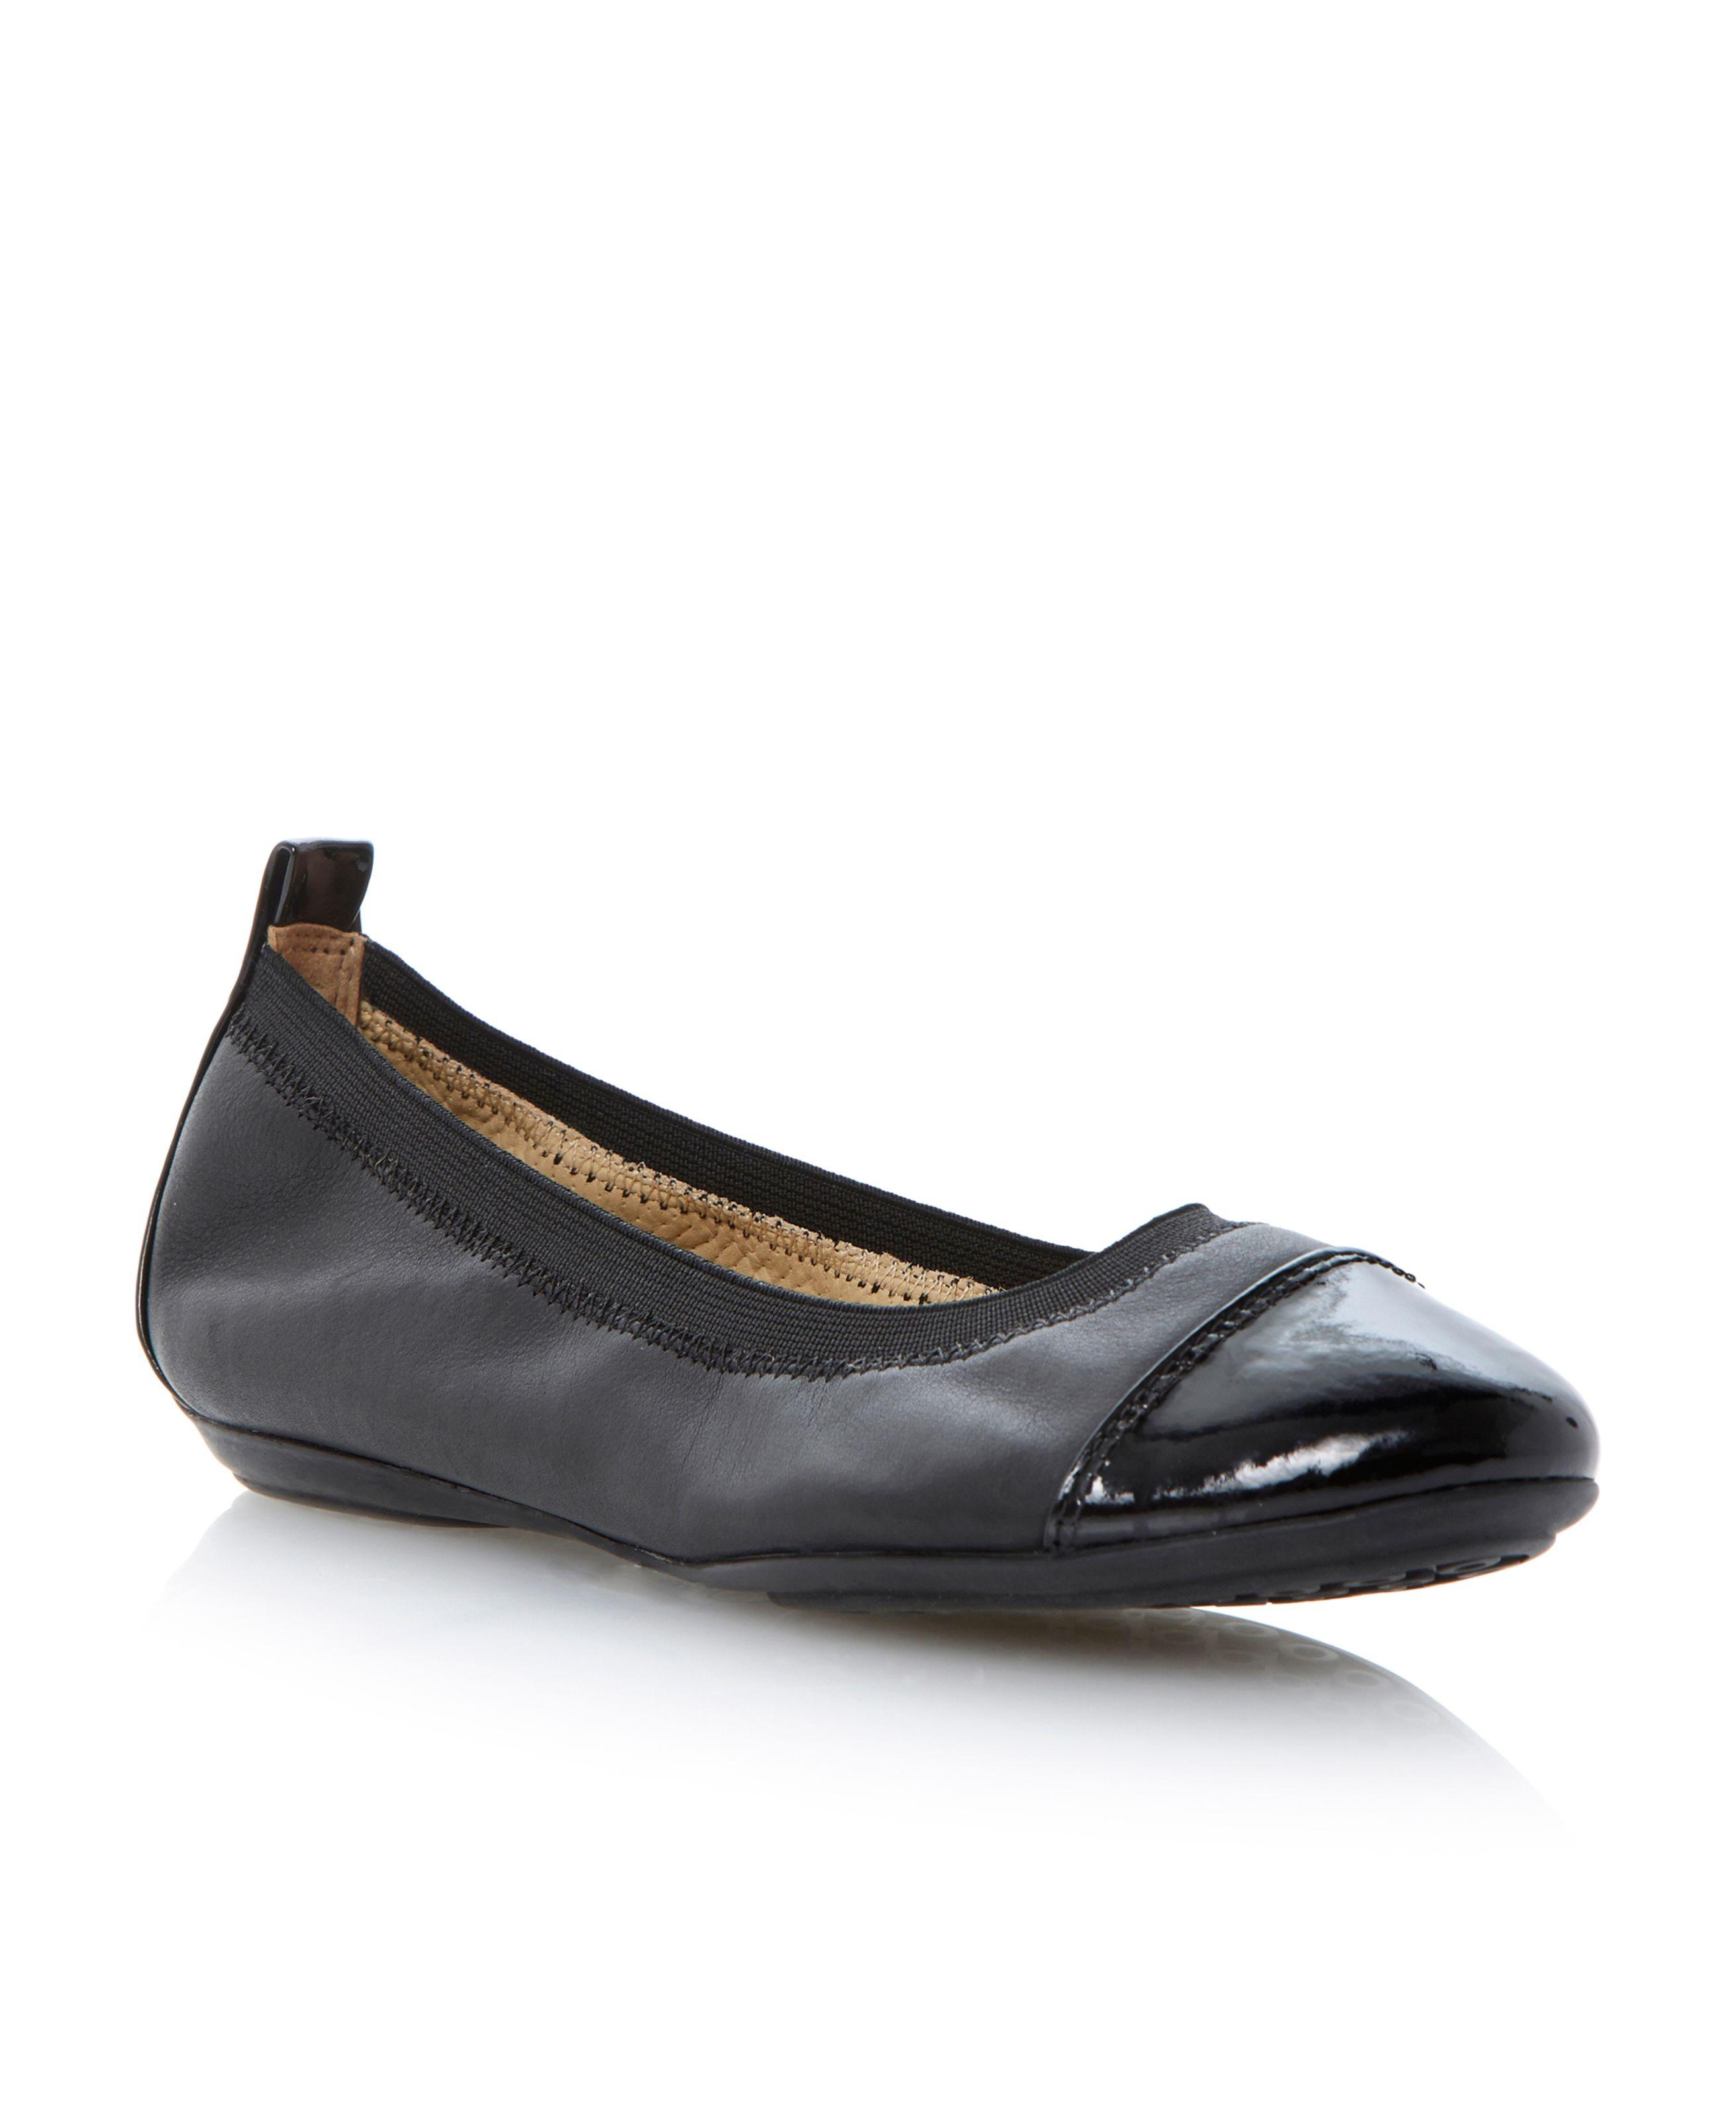 geox charlene leather flat toe ballerina shoes in